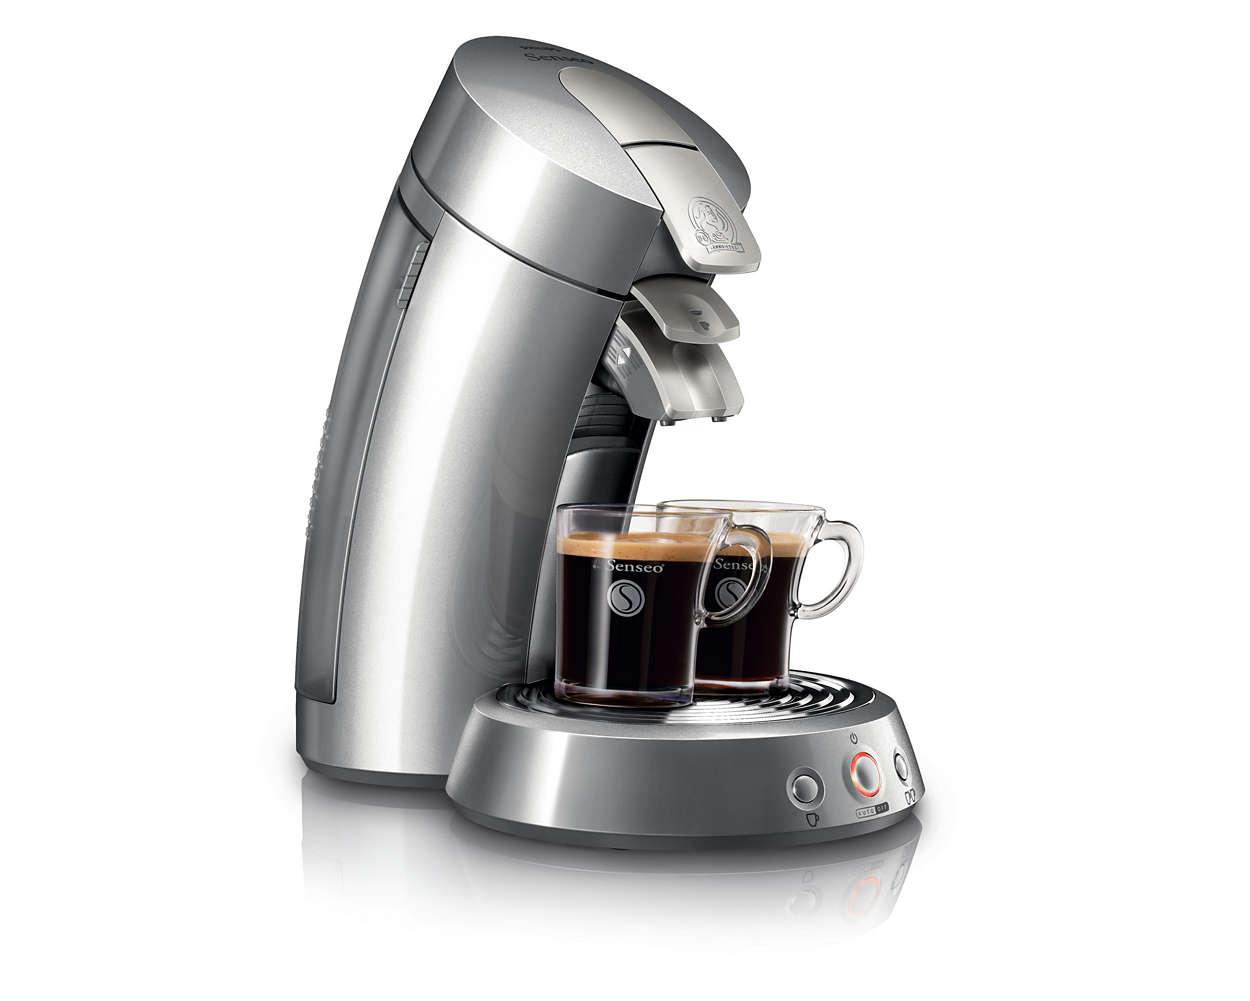 kaffeepadmaschine hd7824 50 senseo. Black Bedroom Furniture Sets. Home Design Ideas